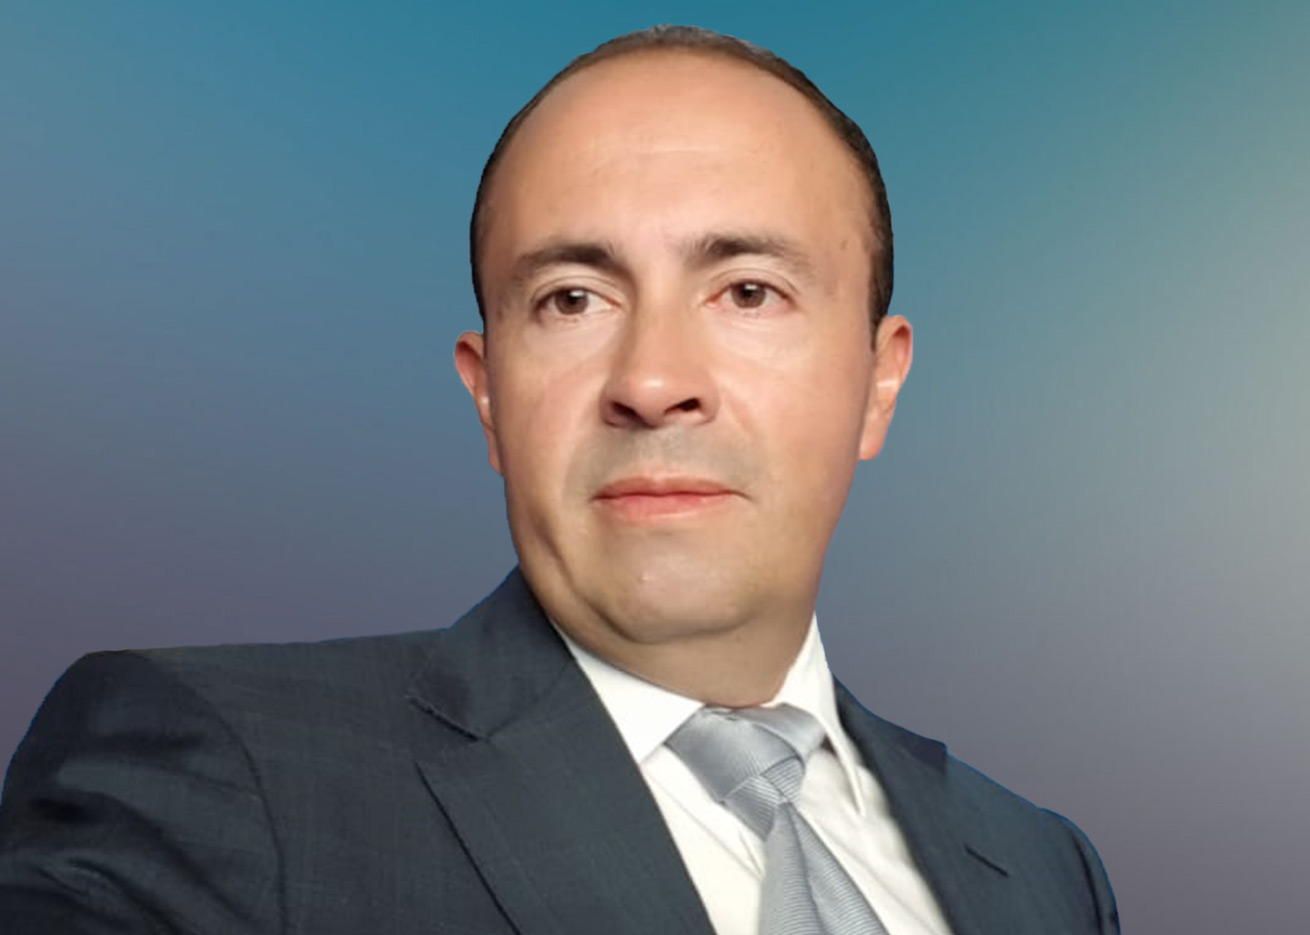 Dr. Andres Castillo Montenegro